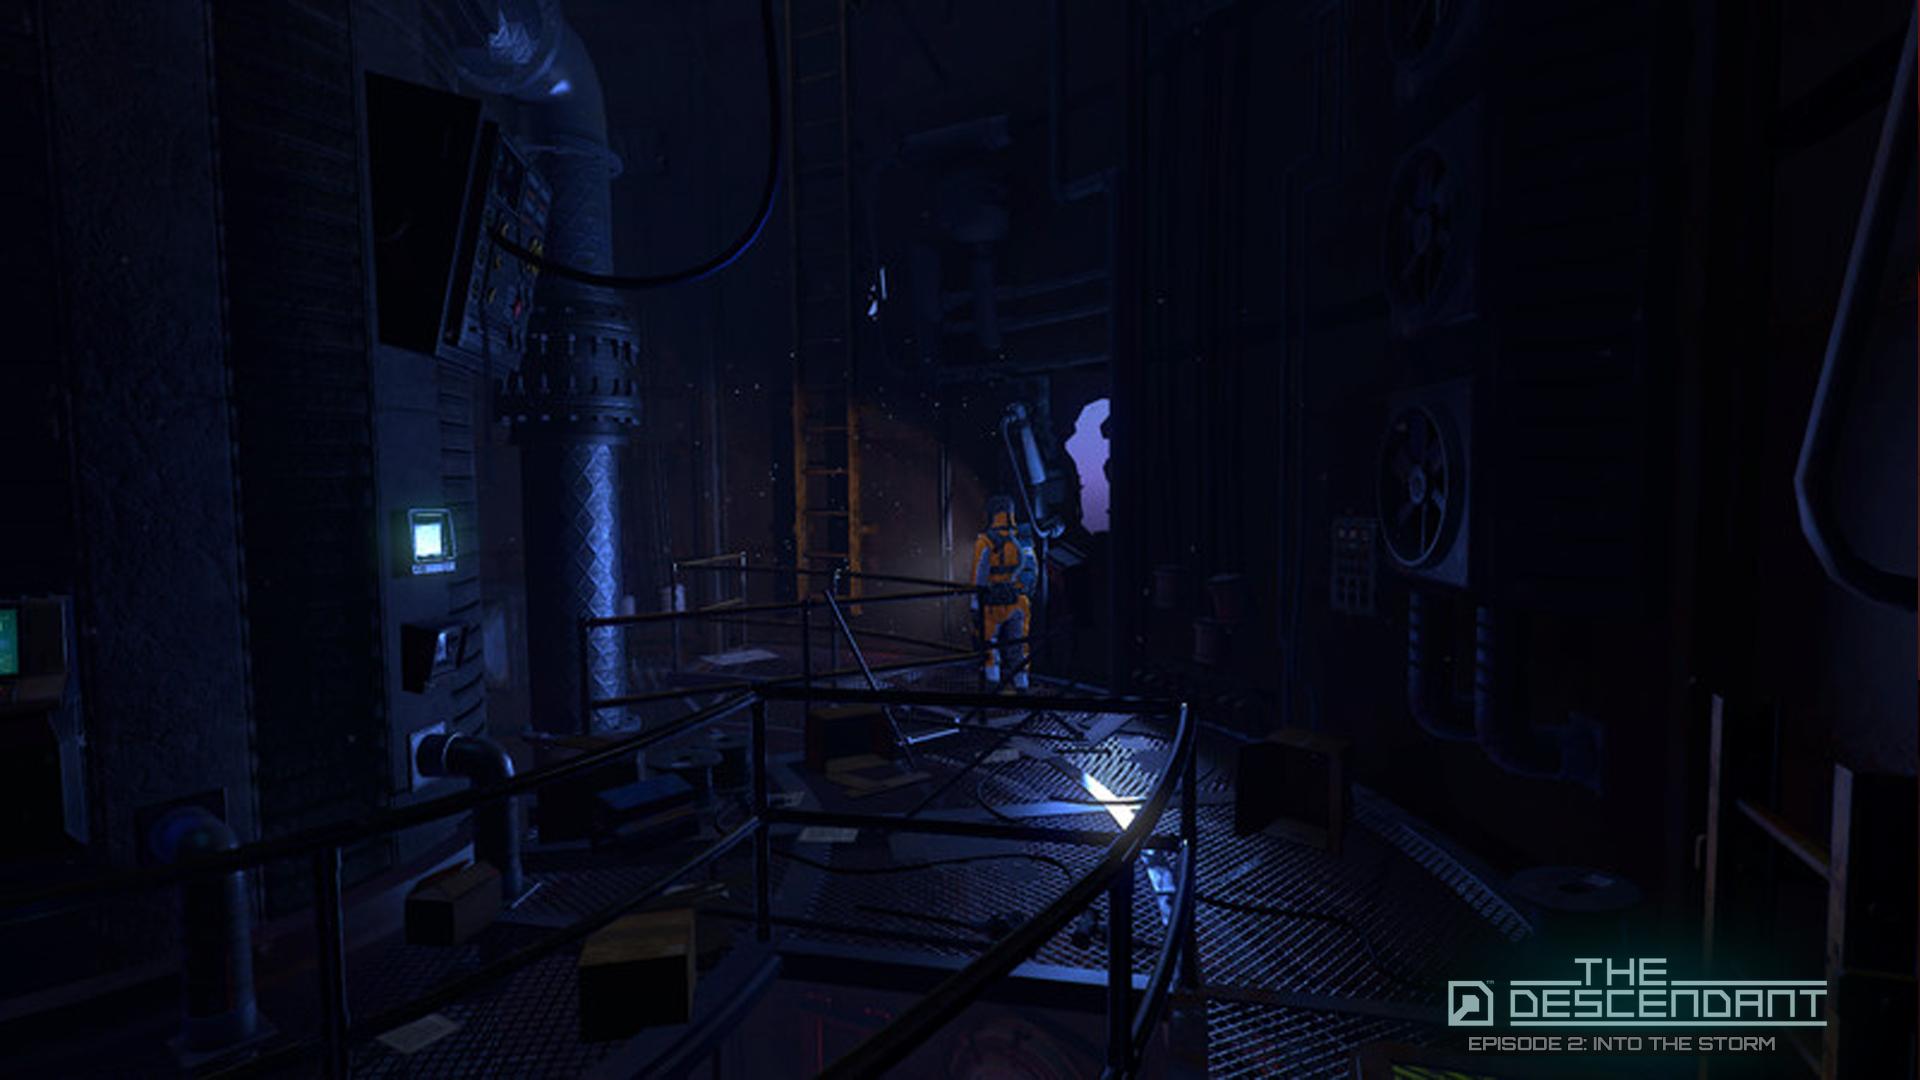 The Descendant: Rest of Season screenshot